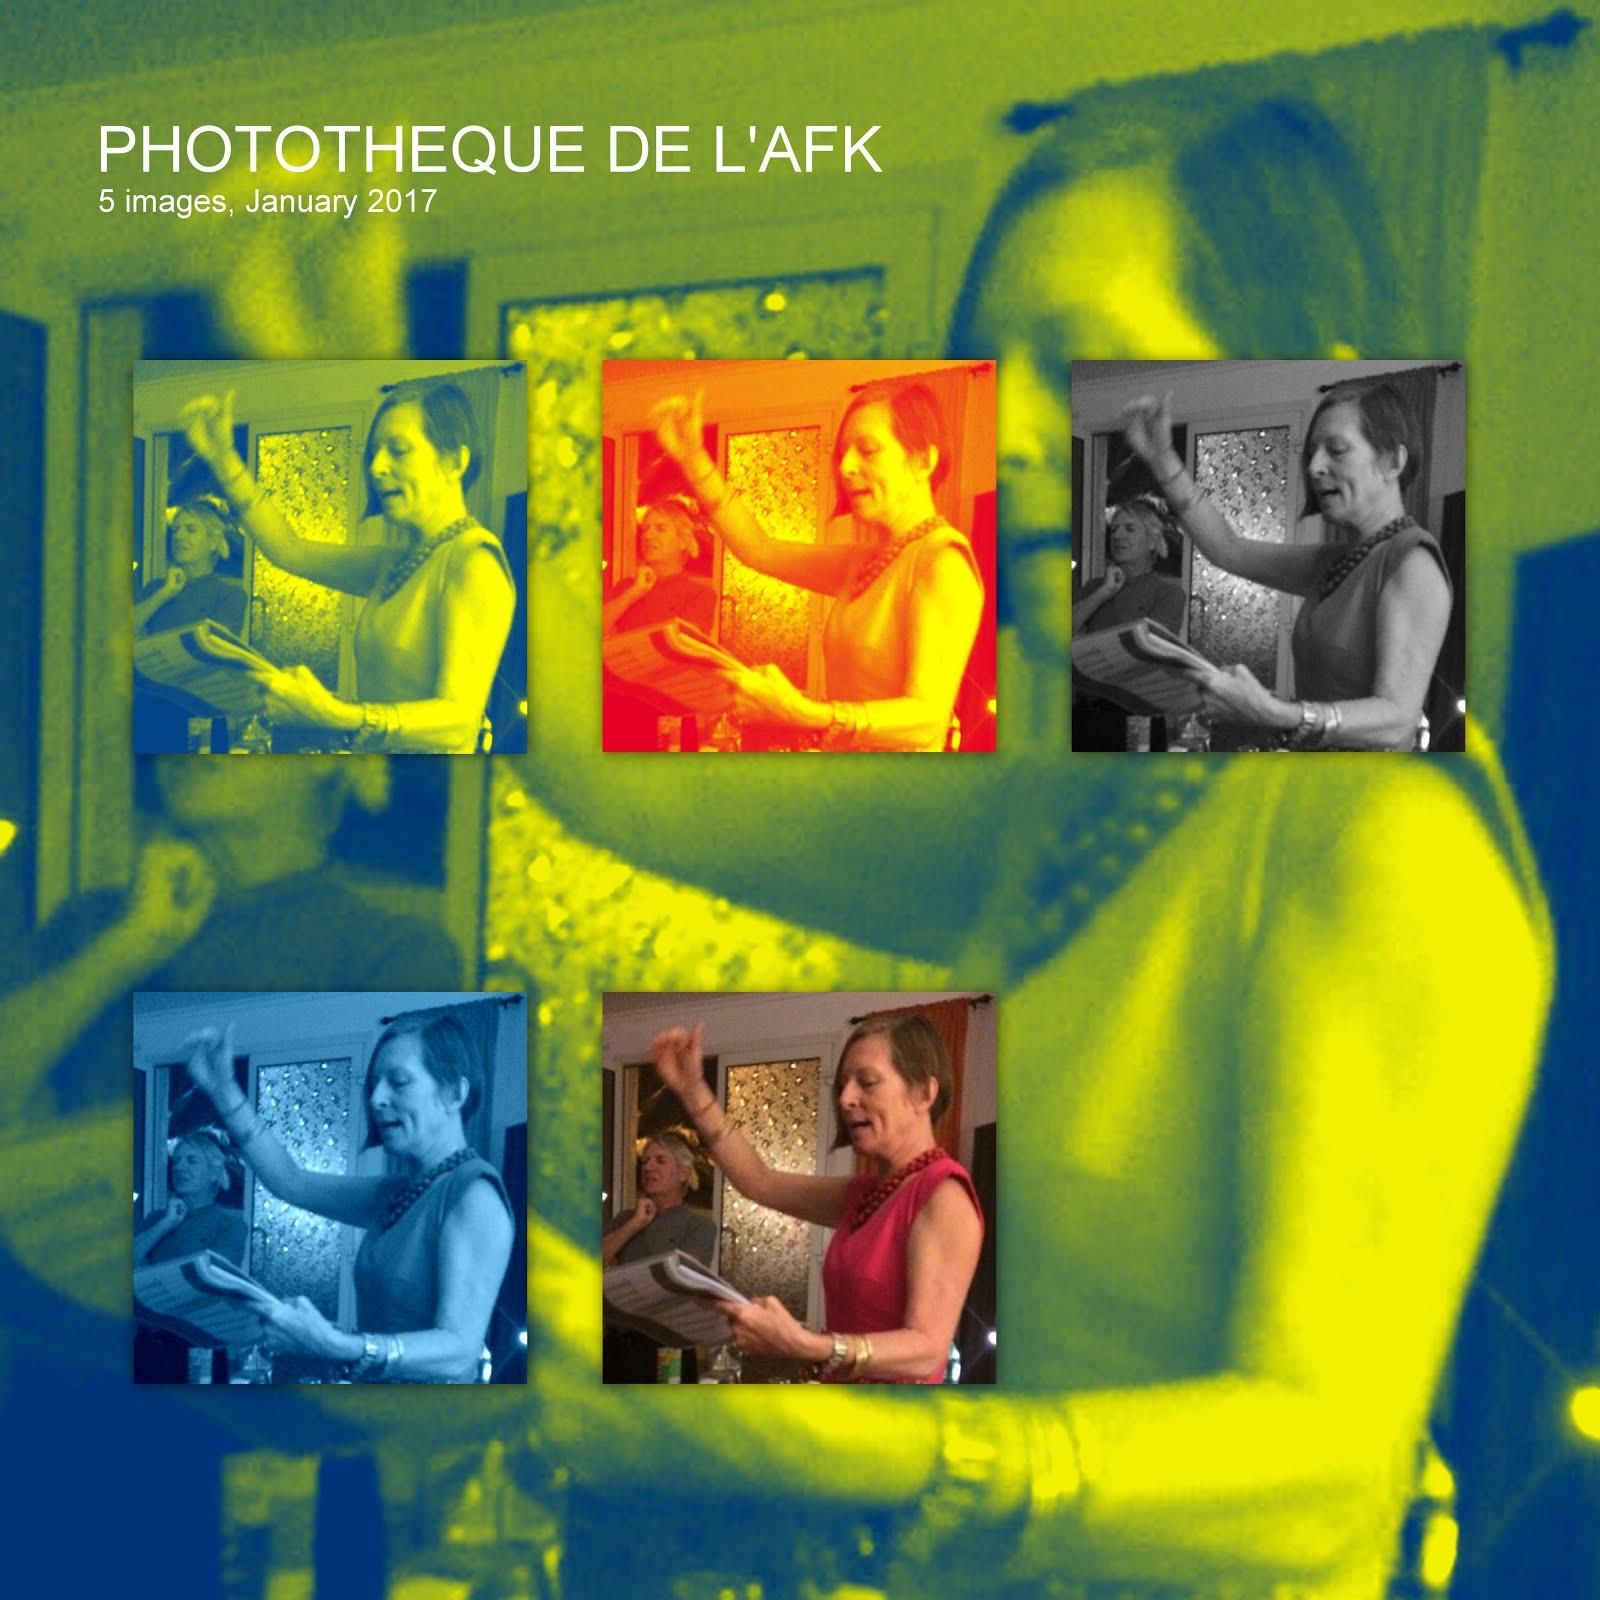 Photothèque de l'AFK